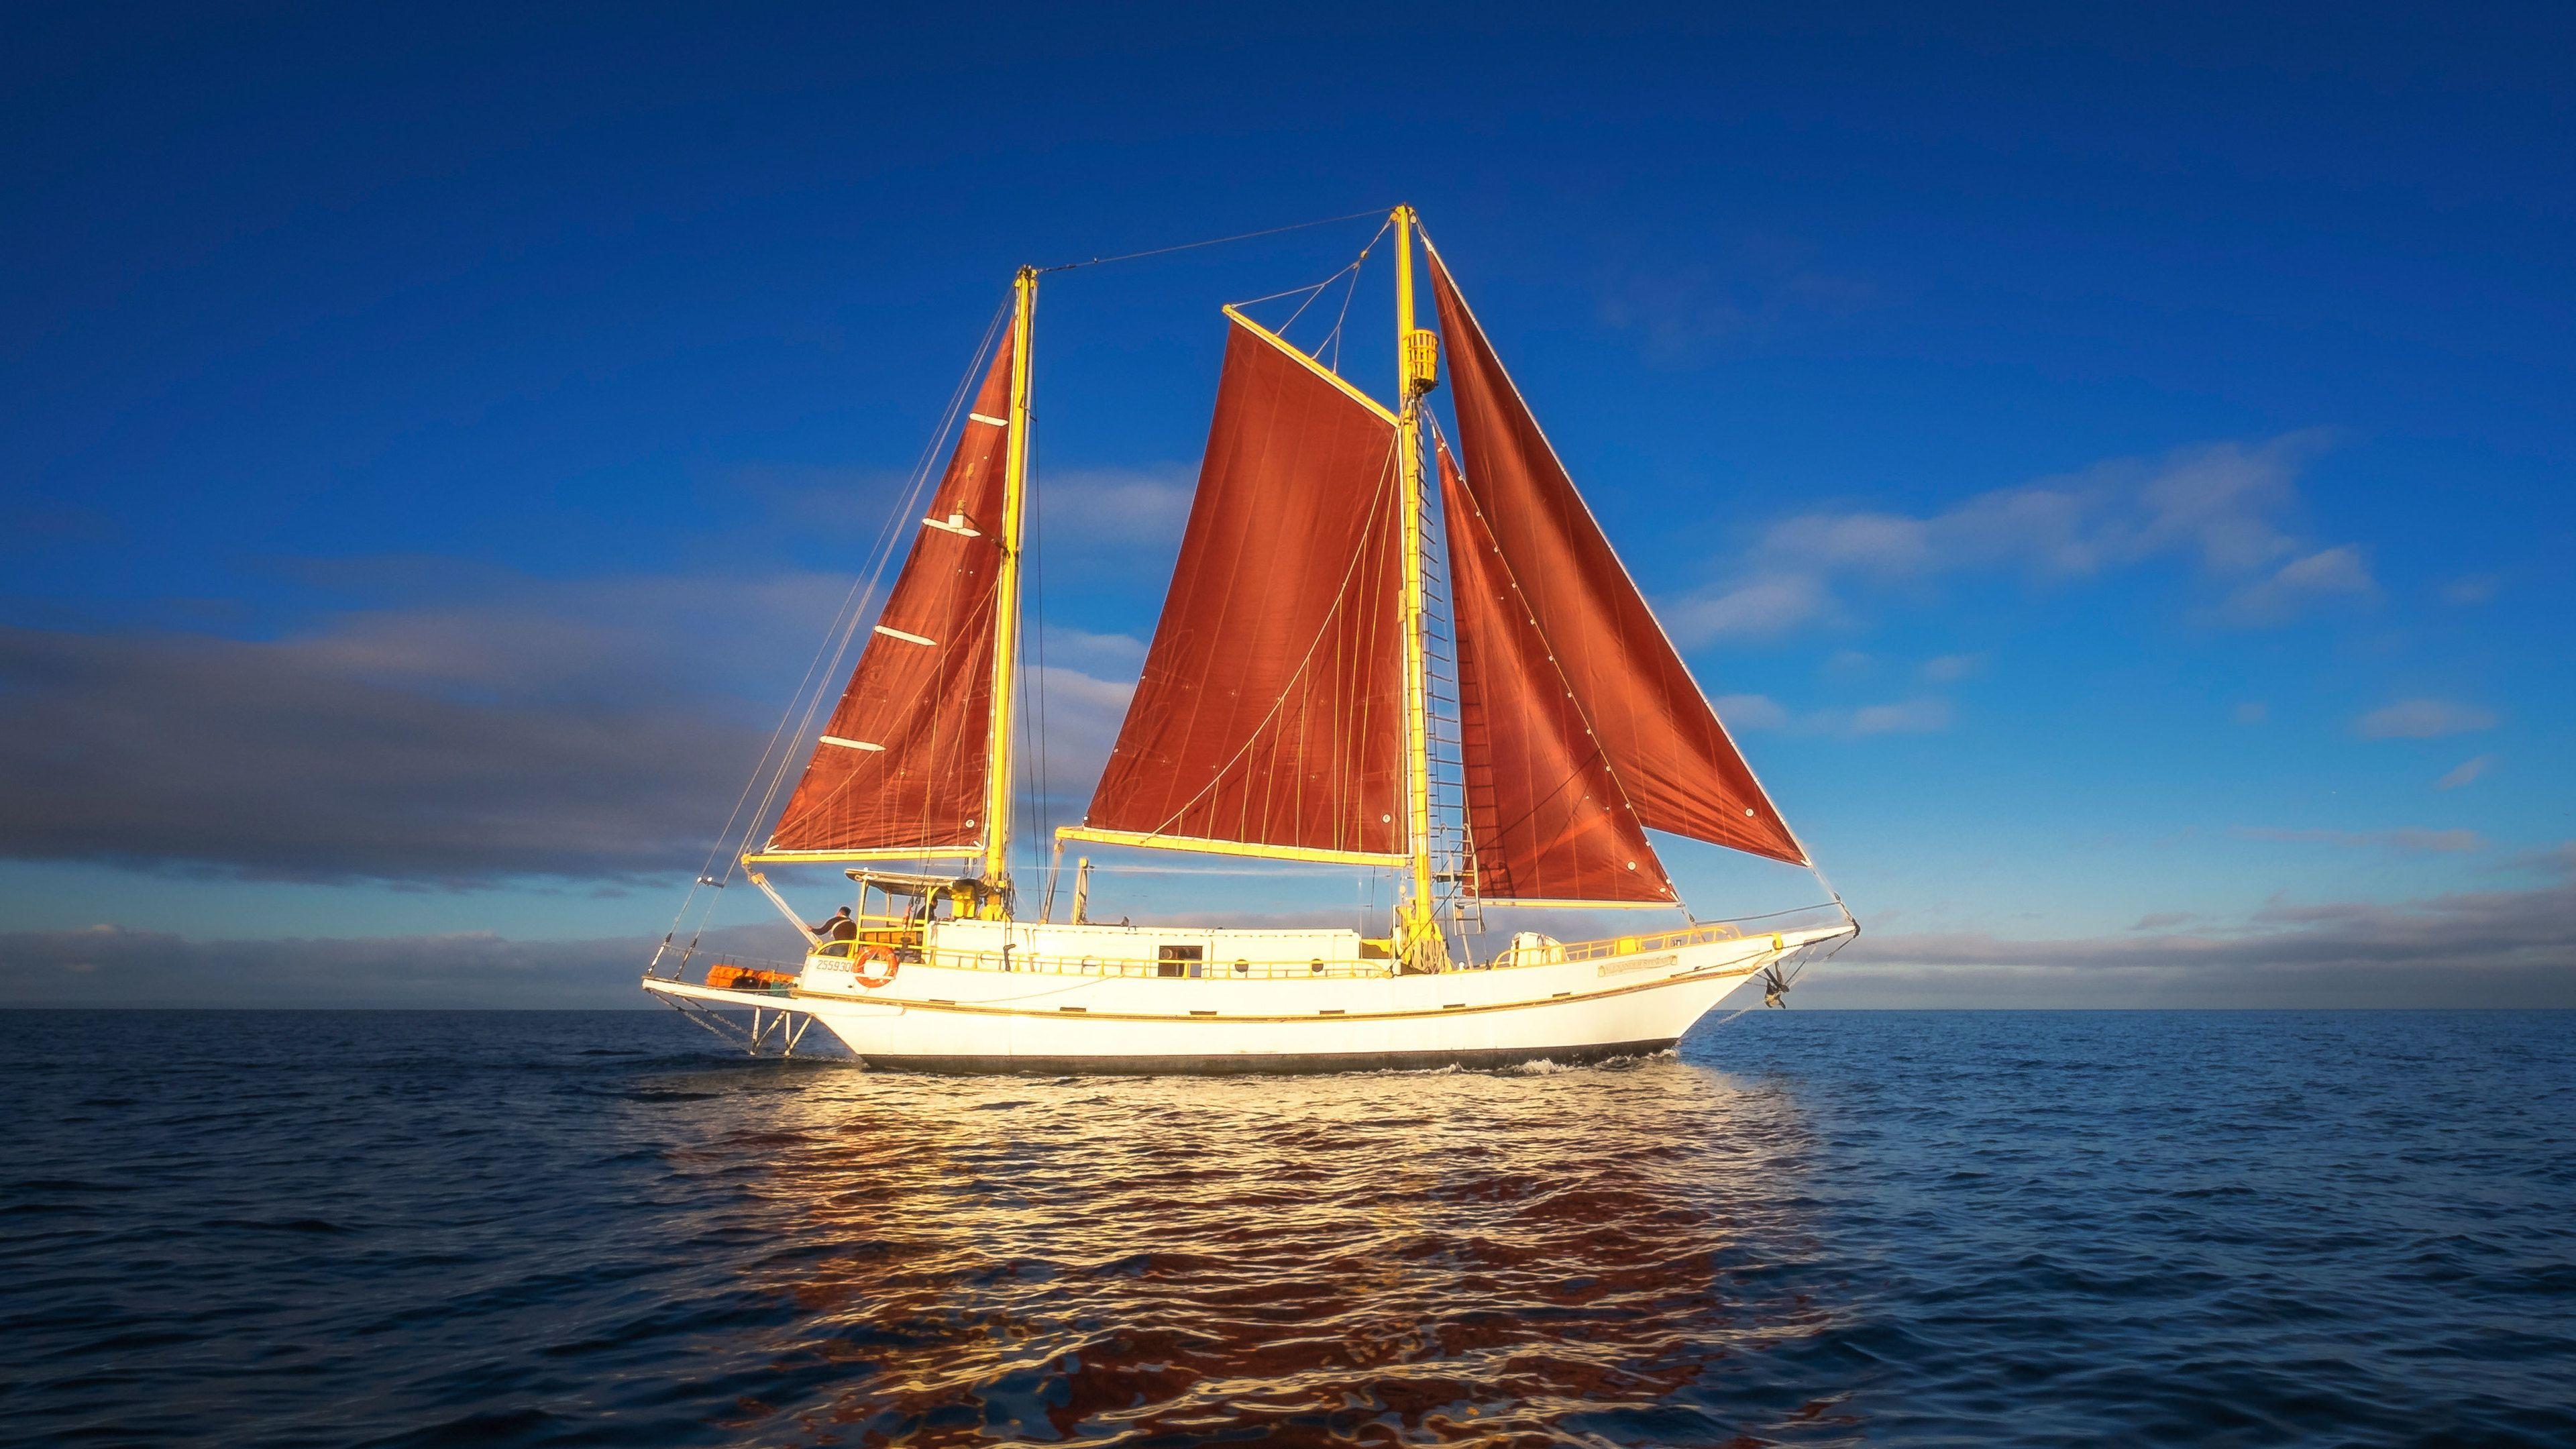 A sailboat on the high seas